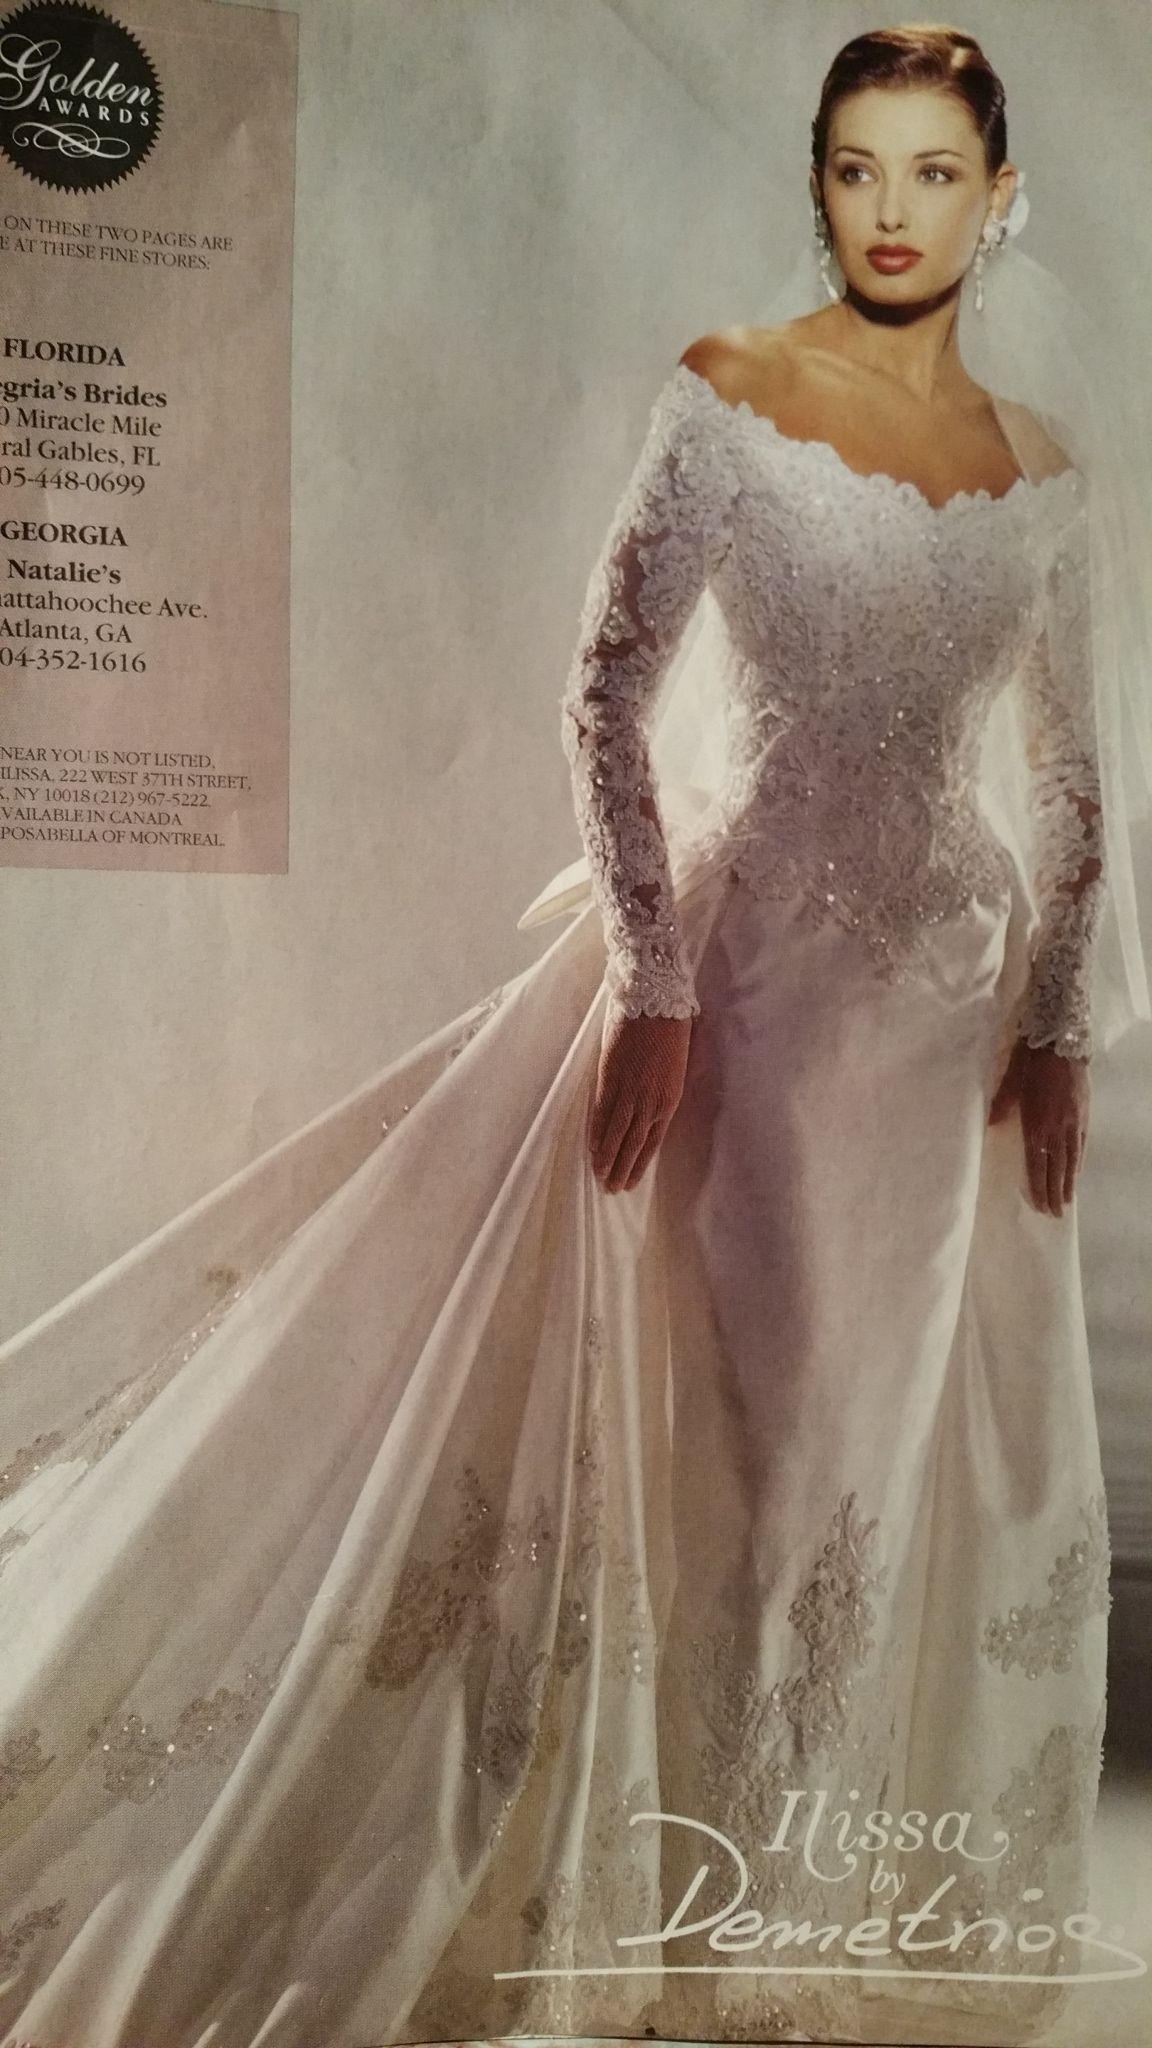 Demetrios 1995 90s Wedding Dress Wedding Gowns Vintage Kleinfeld Bridal